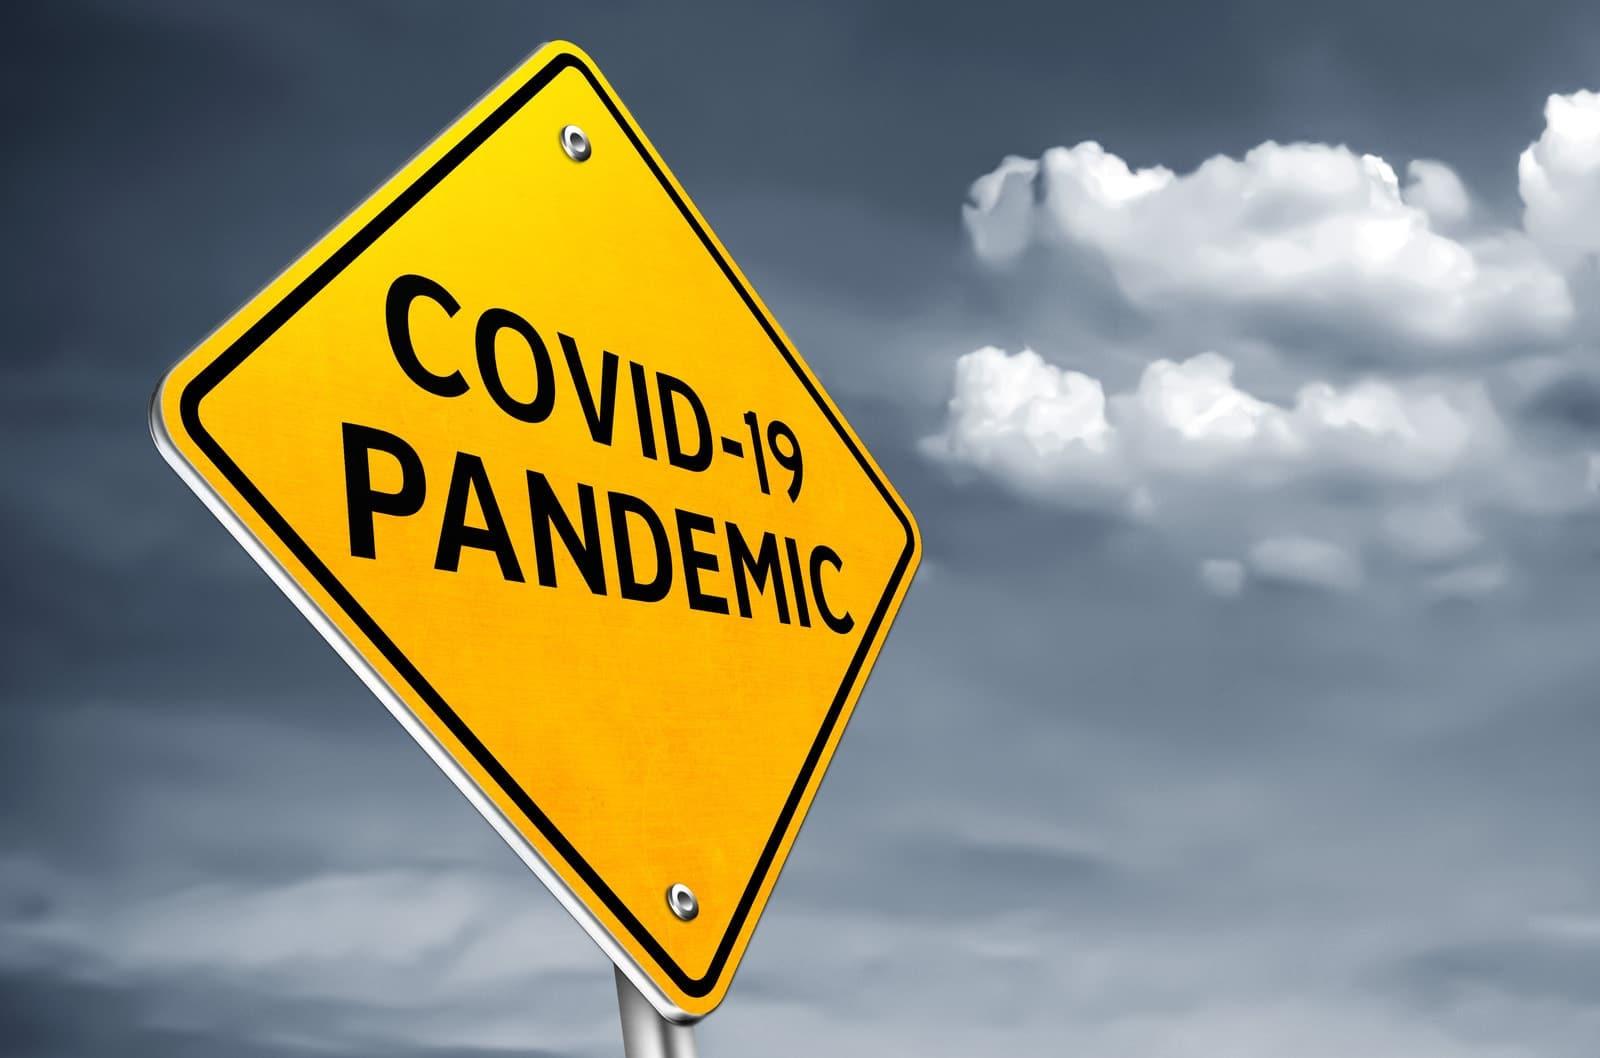 Precautions Concerning COVID-19